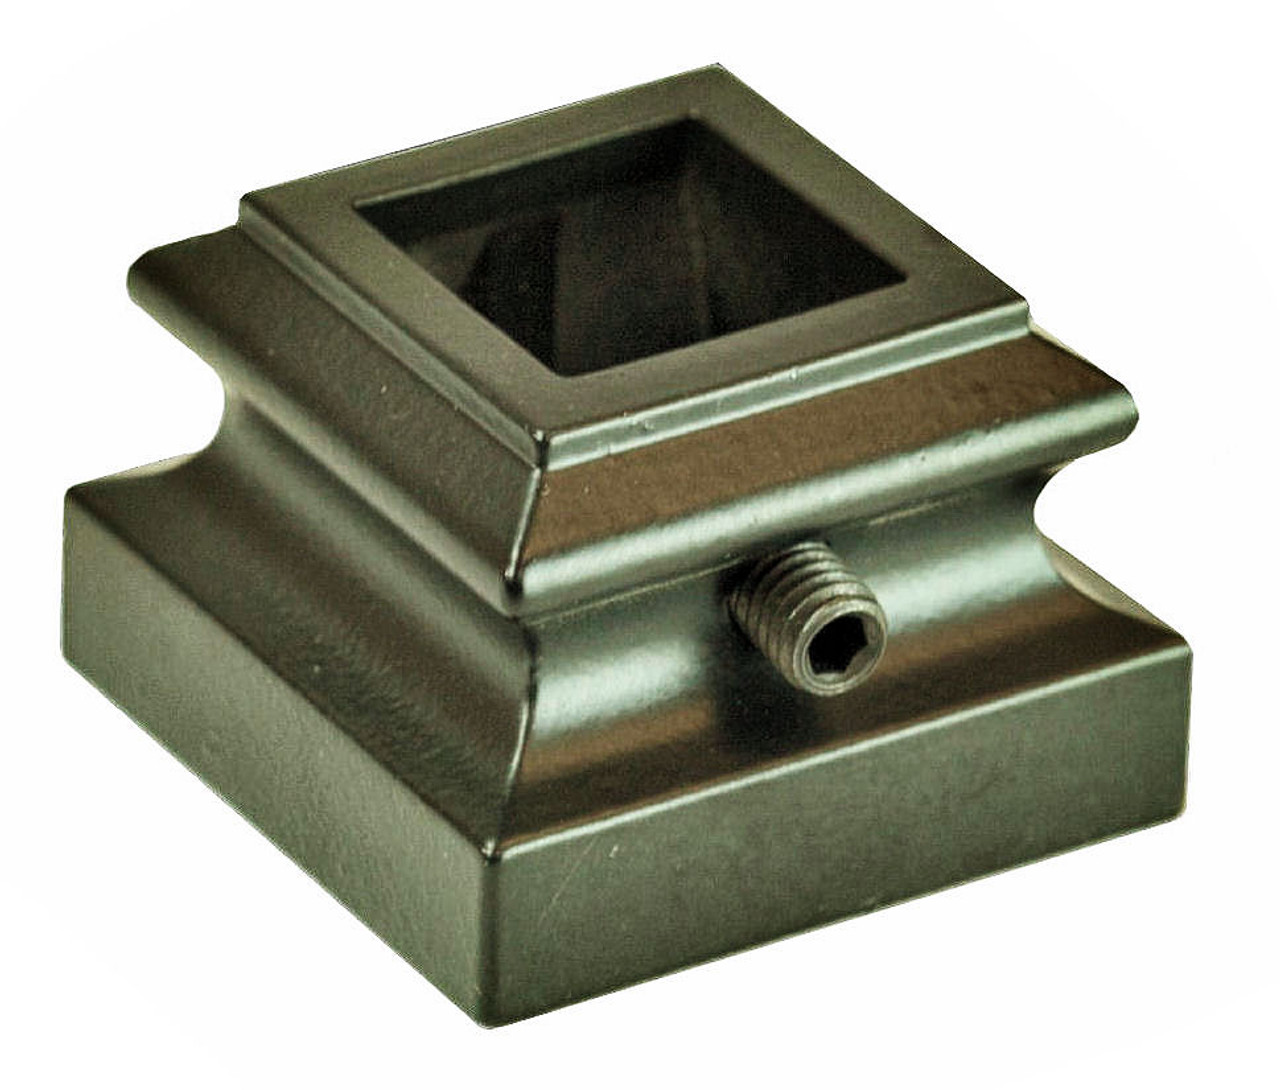 2392 Mega 19mm Flat Shoe with set screw